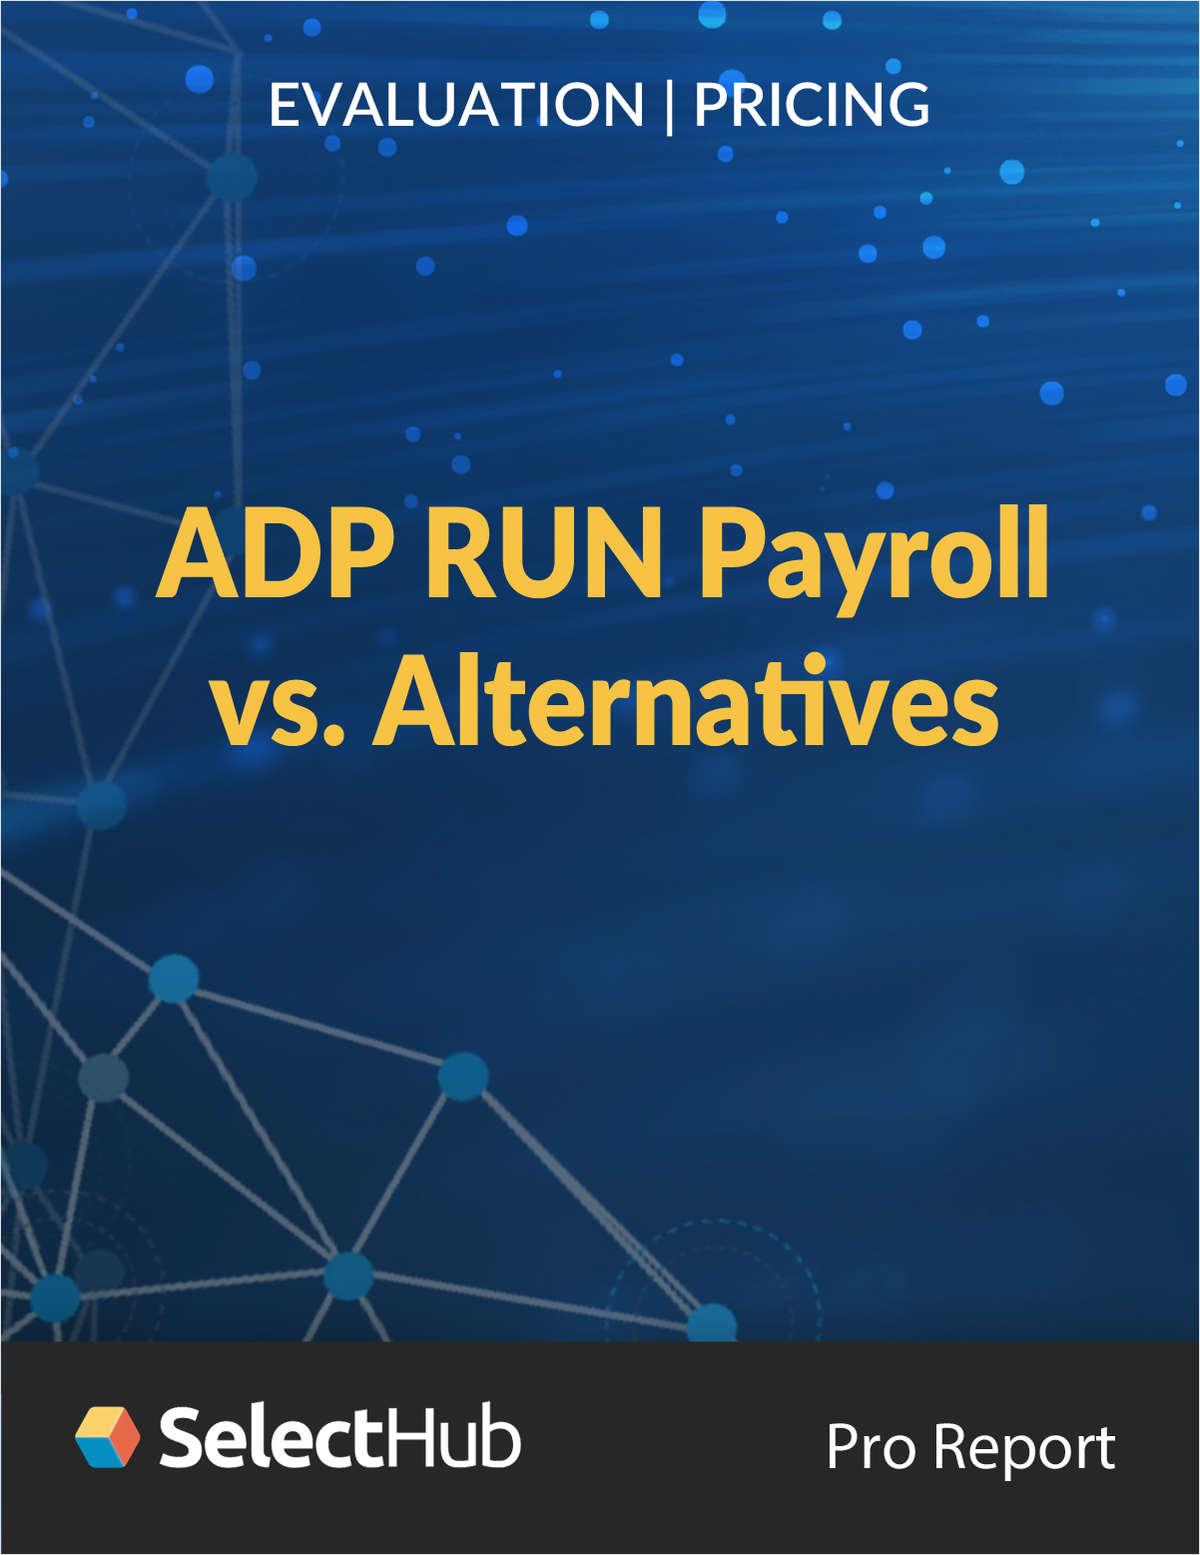 ADP RUN Payroll vs. Top Alternatives―Evaluation & Pricing Comparison